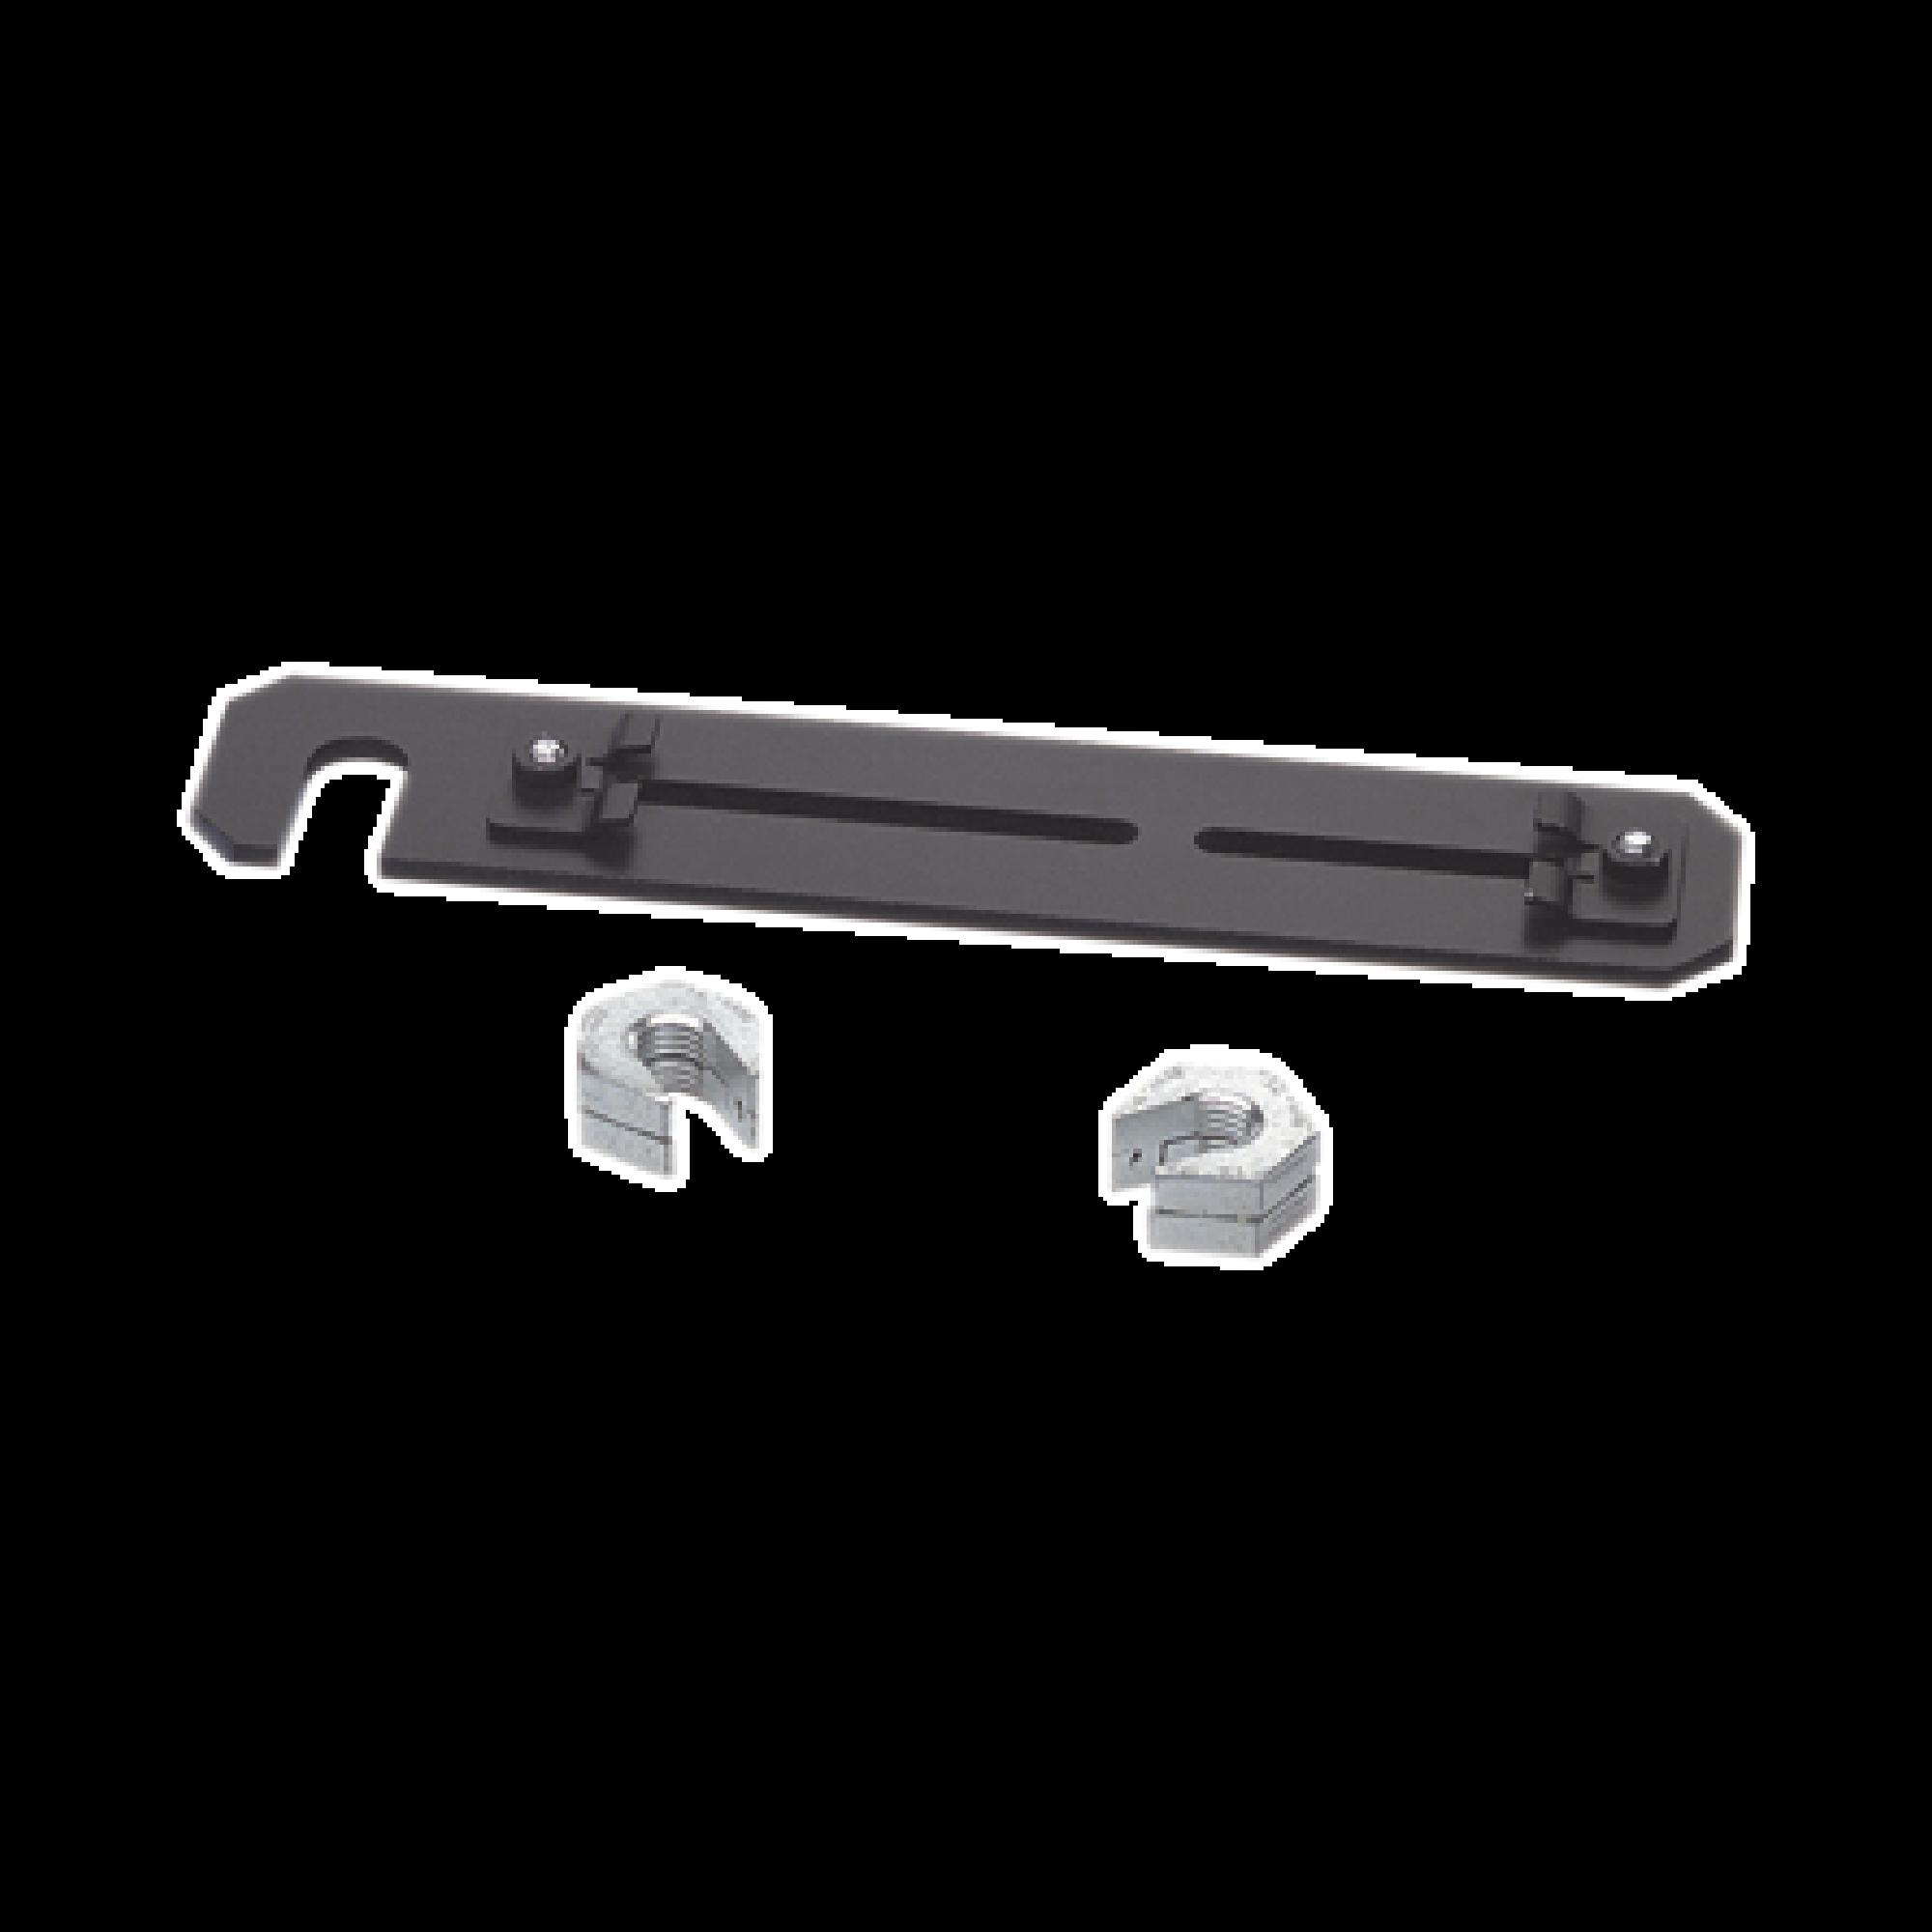 Soporte de Montaje a Techo, para Canaletas FiberRunner 4X4 o 6x4, Uso con Varilla Roscada de 5/8, Color Negro